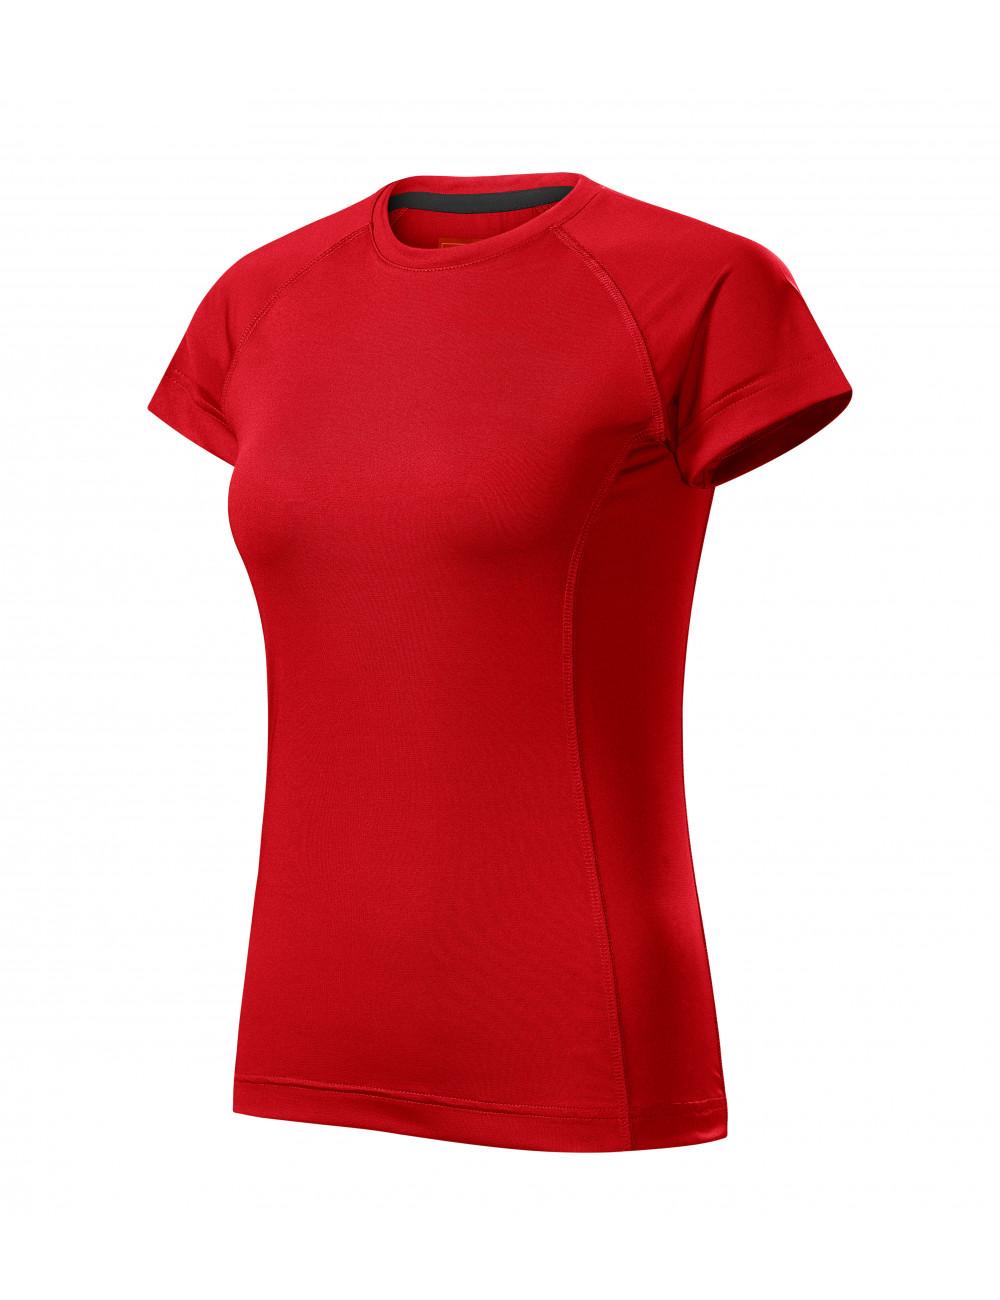 Adler MALFINI Koszulka damska Destiny 176 czerwony